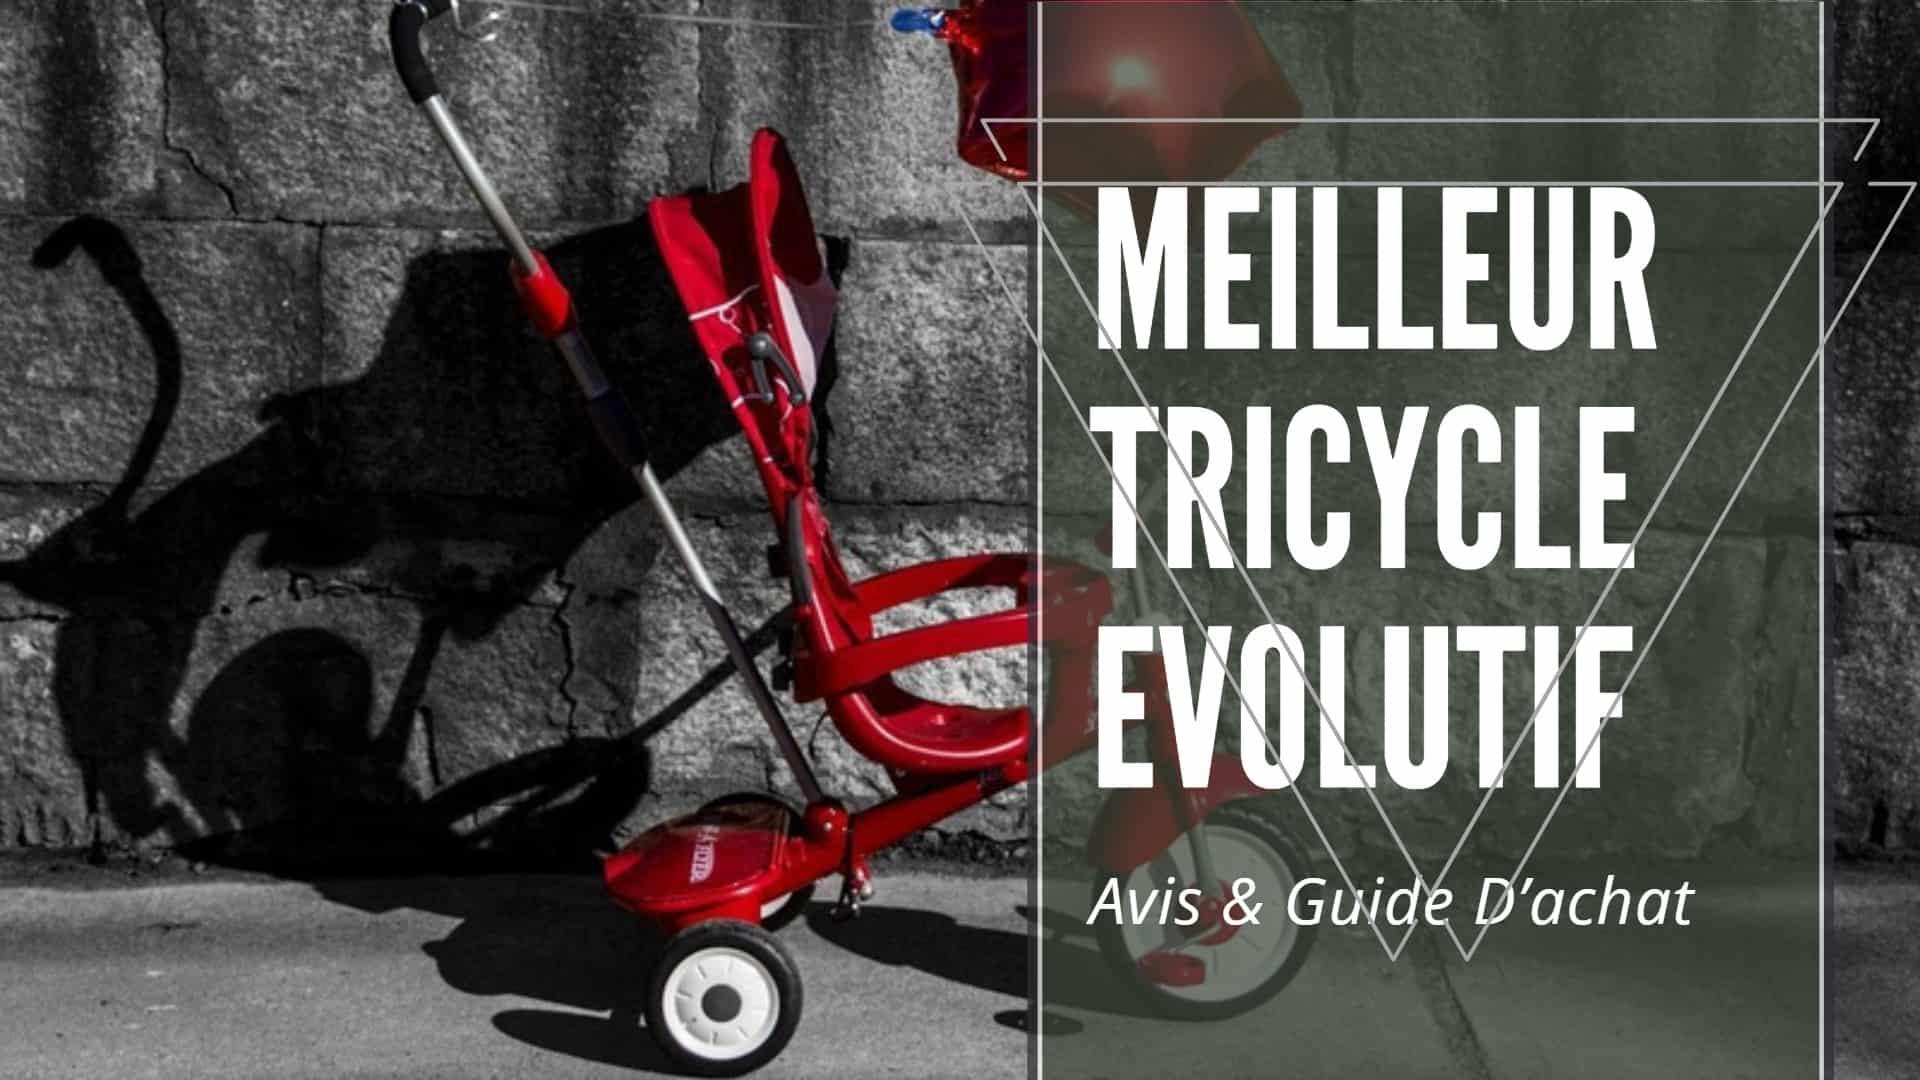 Meilleur tricycle evolutif